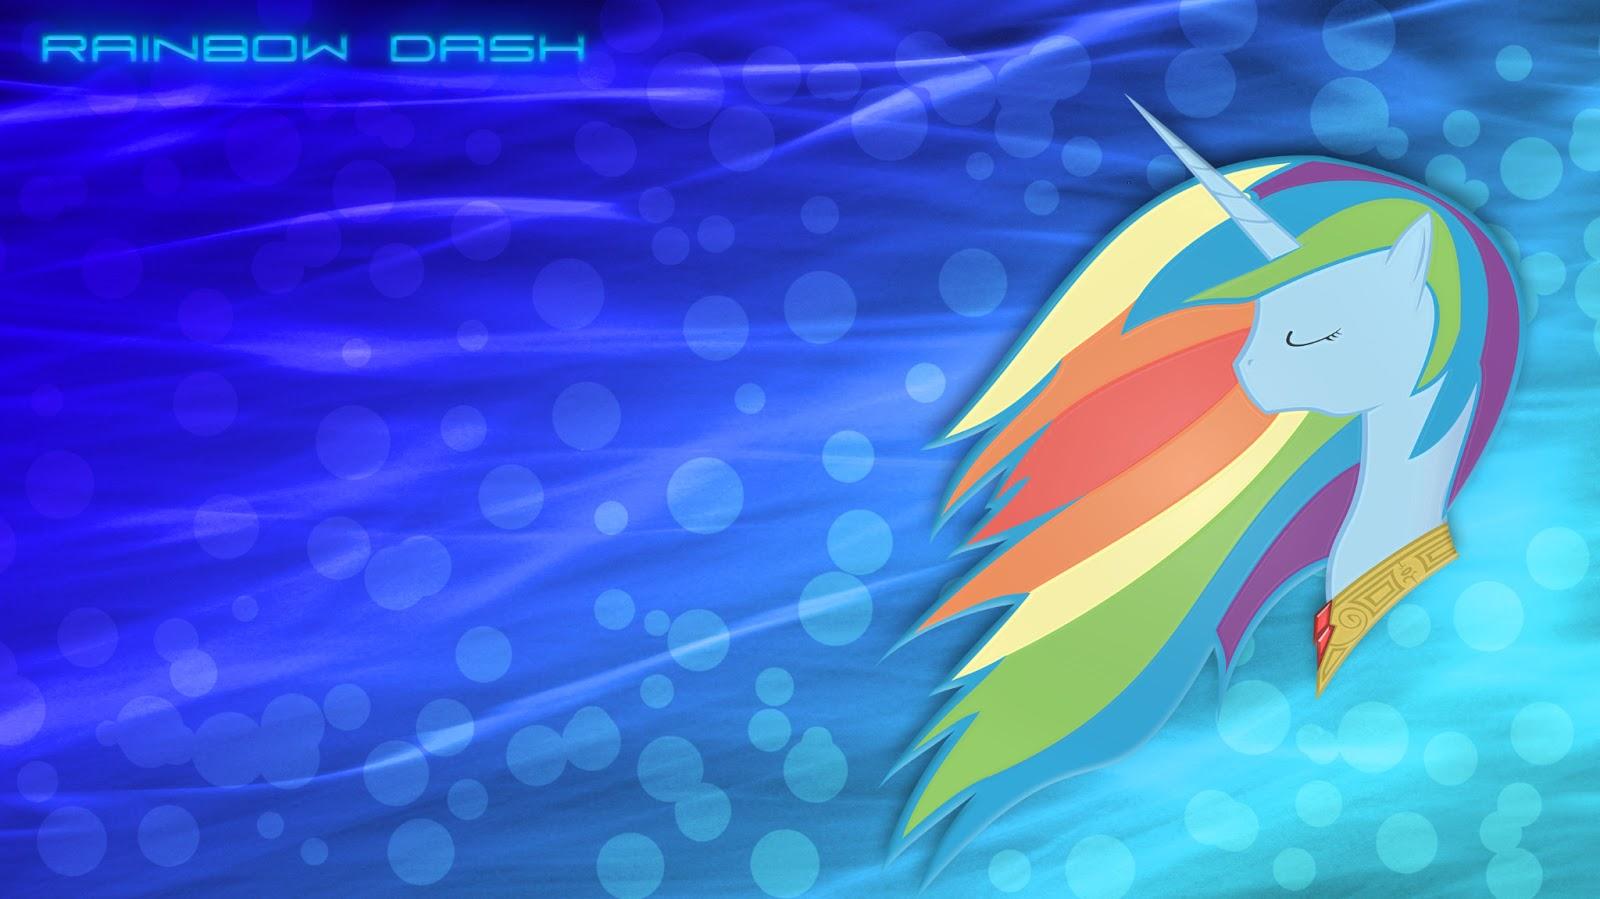 http://4.bp.blogspot.com/-ateDeF2_AQw/USEz8YJt60I/AAAAAAAALGk/2fwzqI2FaHk/s1600/rainbow_dash_wallpaper_4_by_jamesg2498-d5eh0ao.png